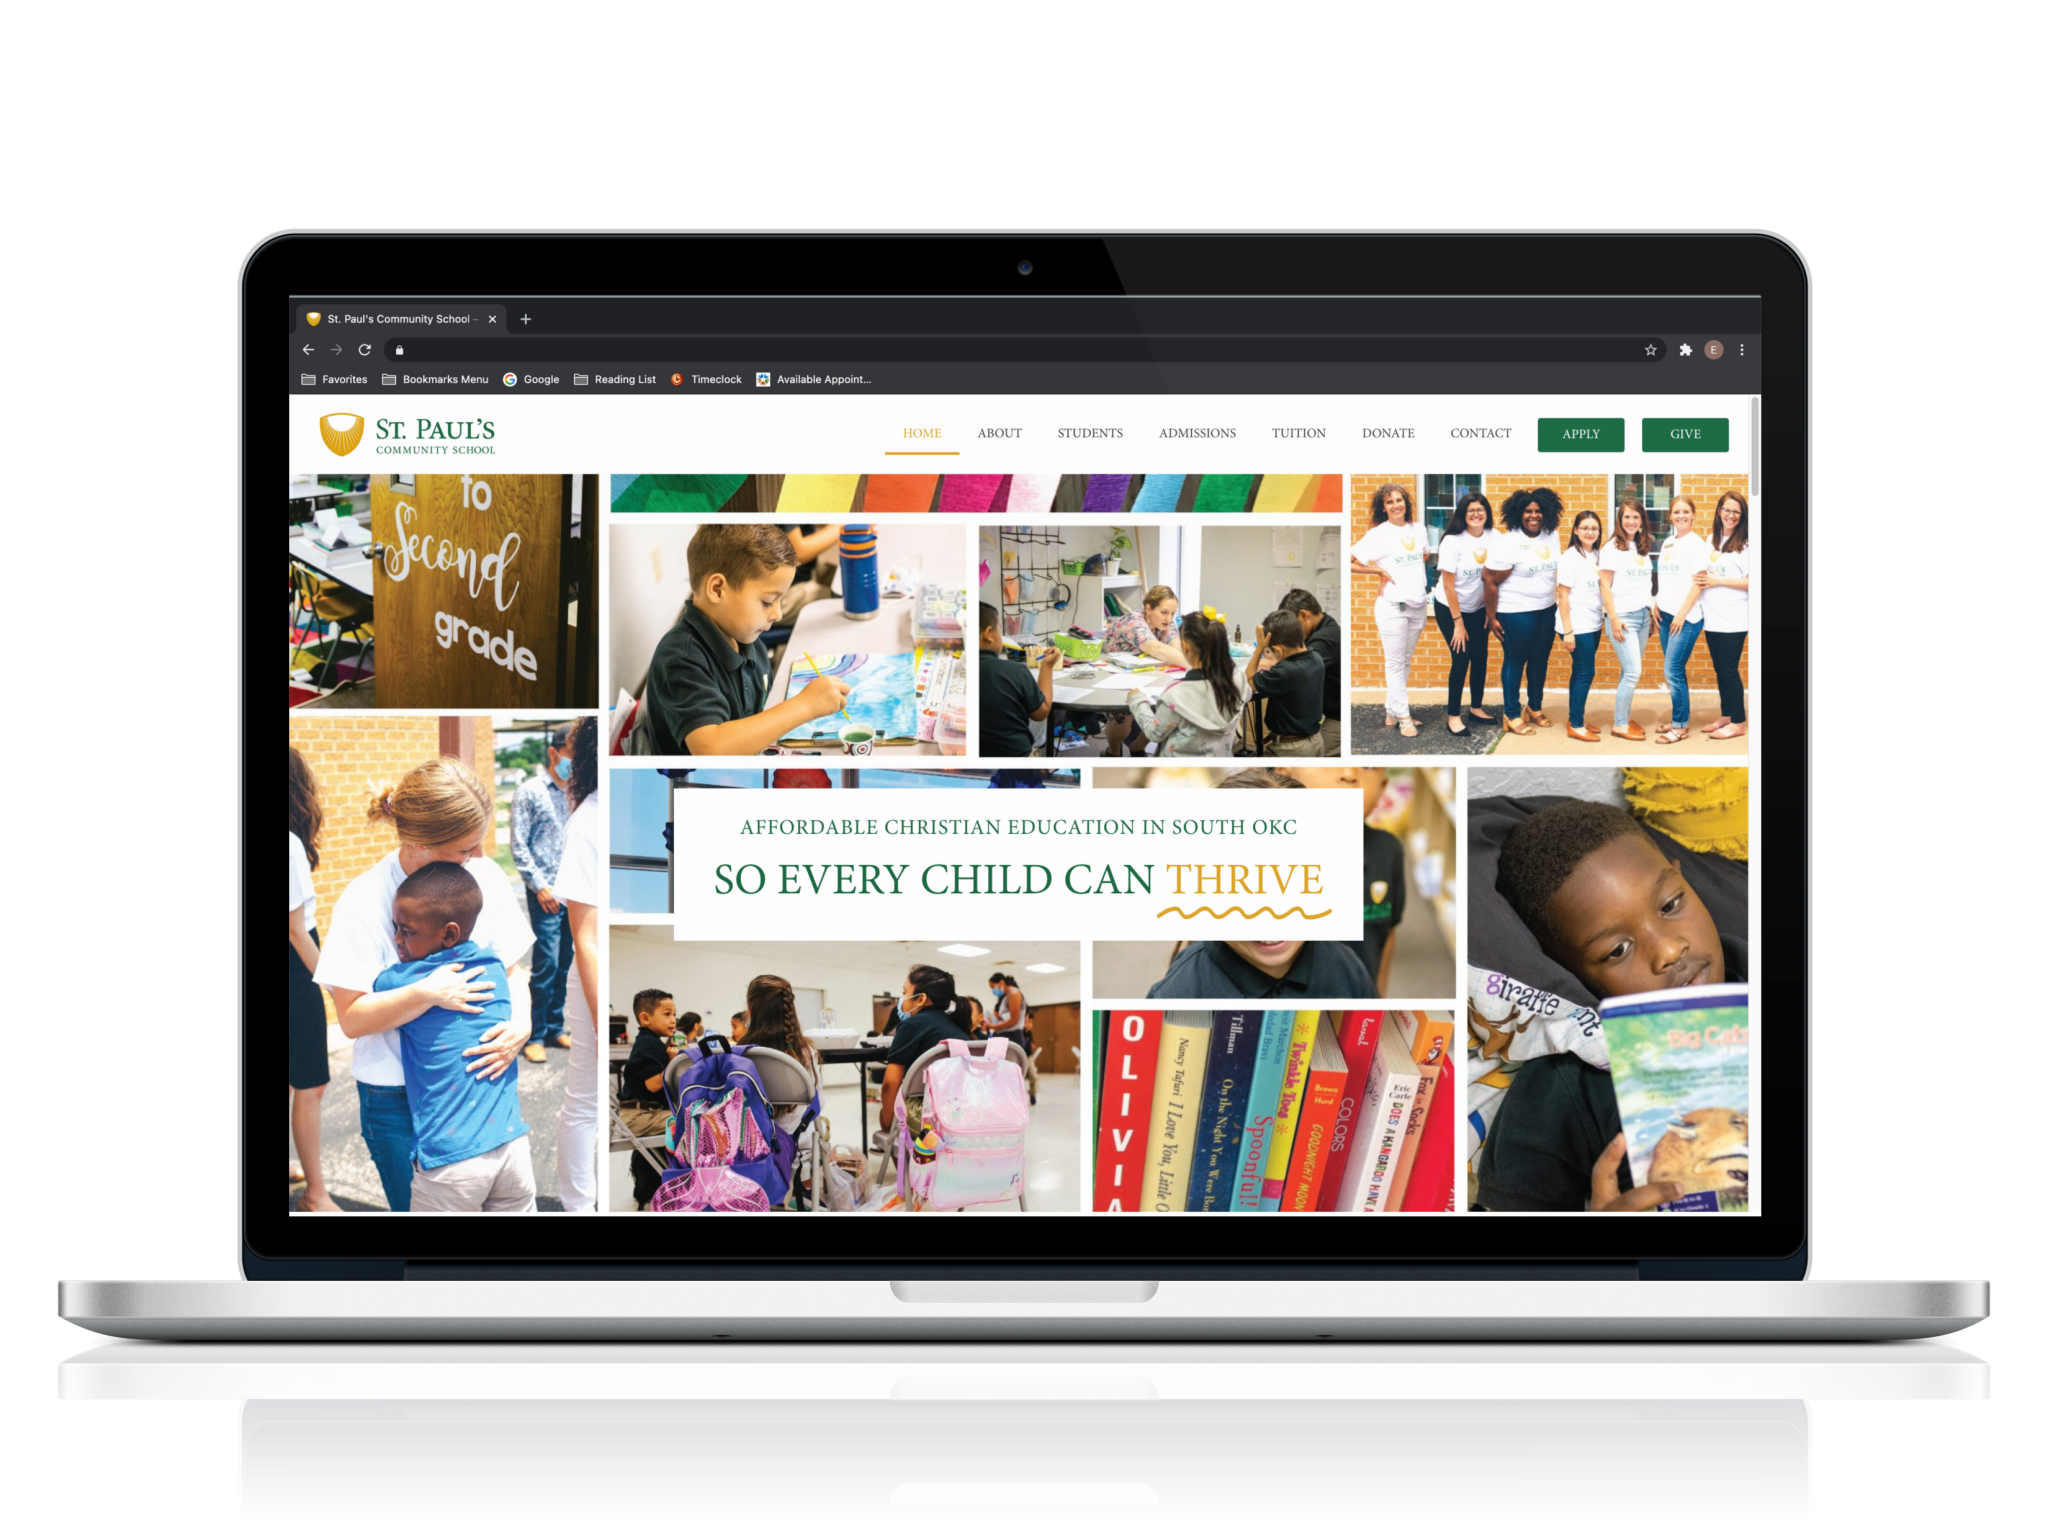 St. Paul's Community School website on computer